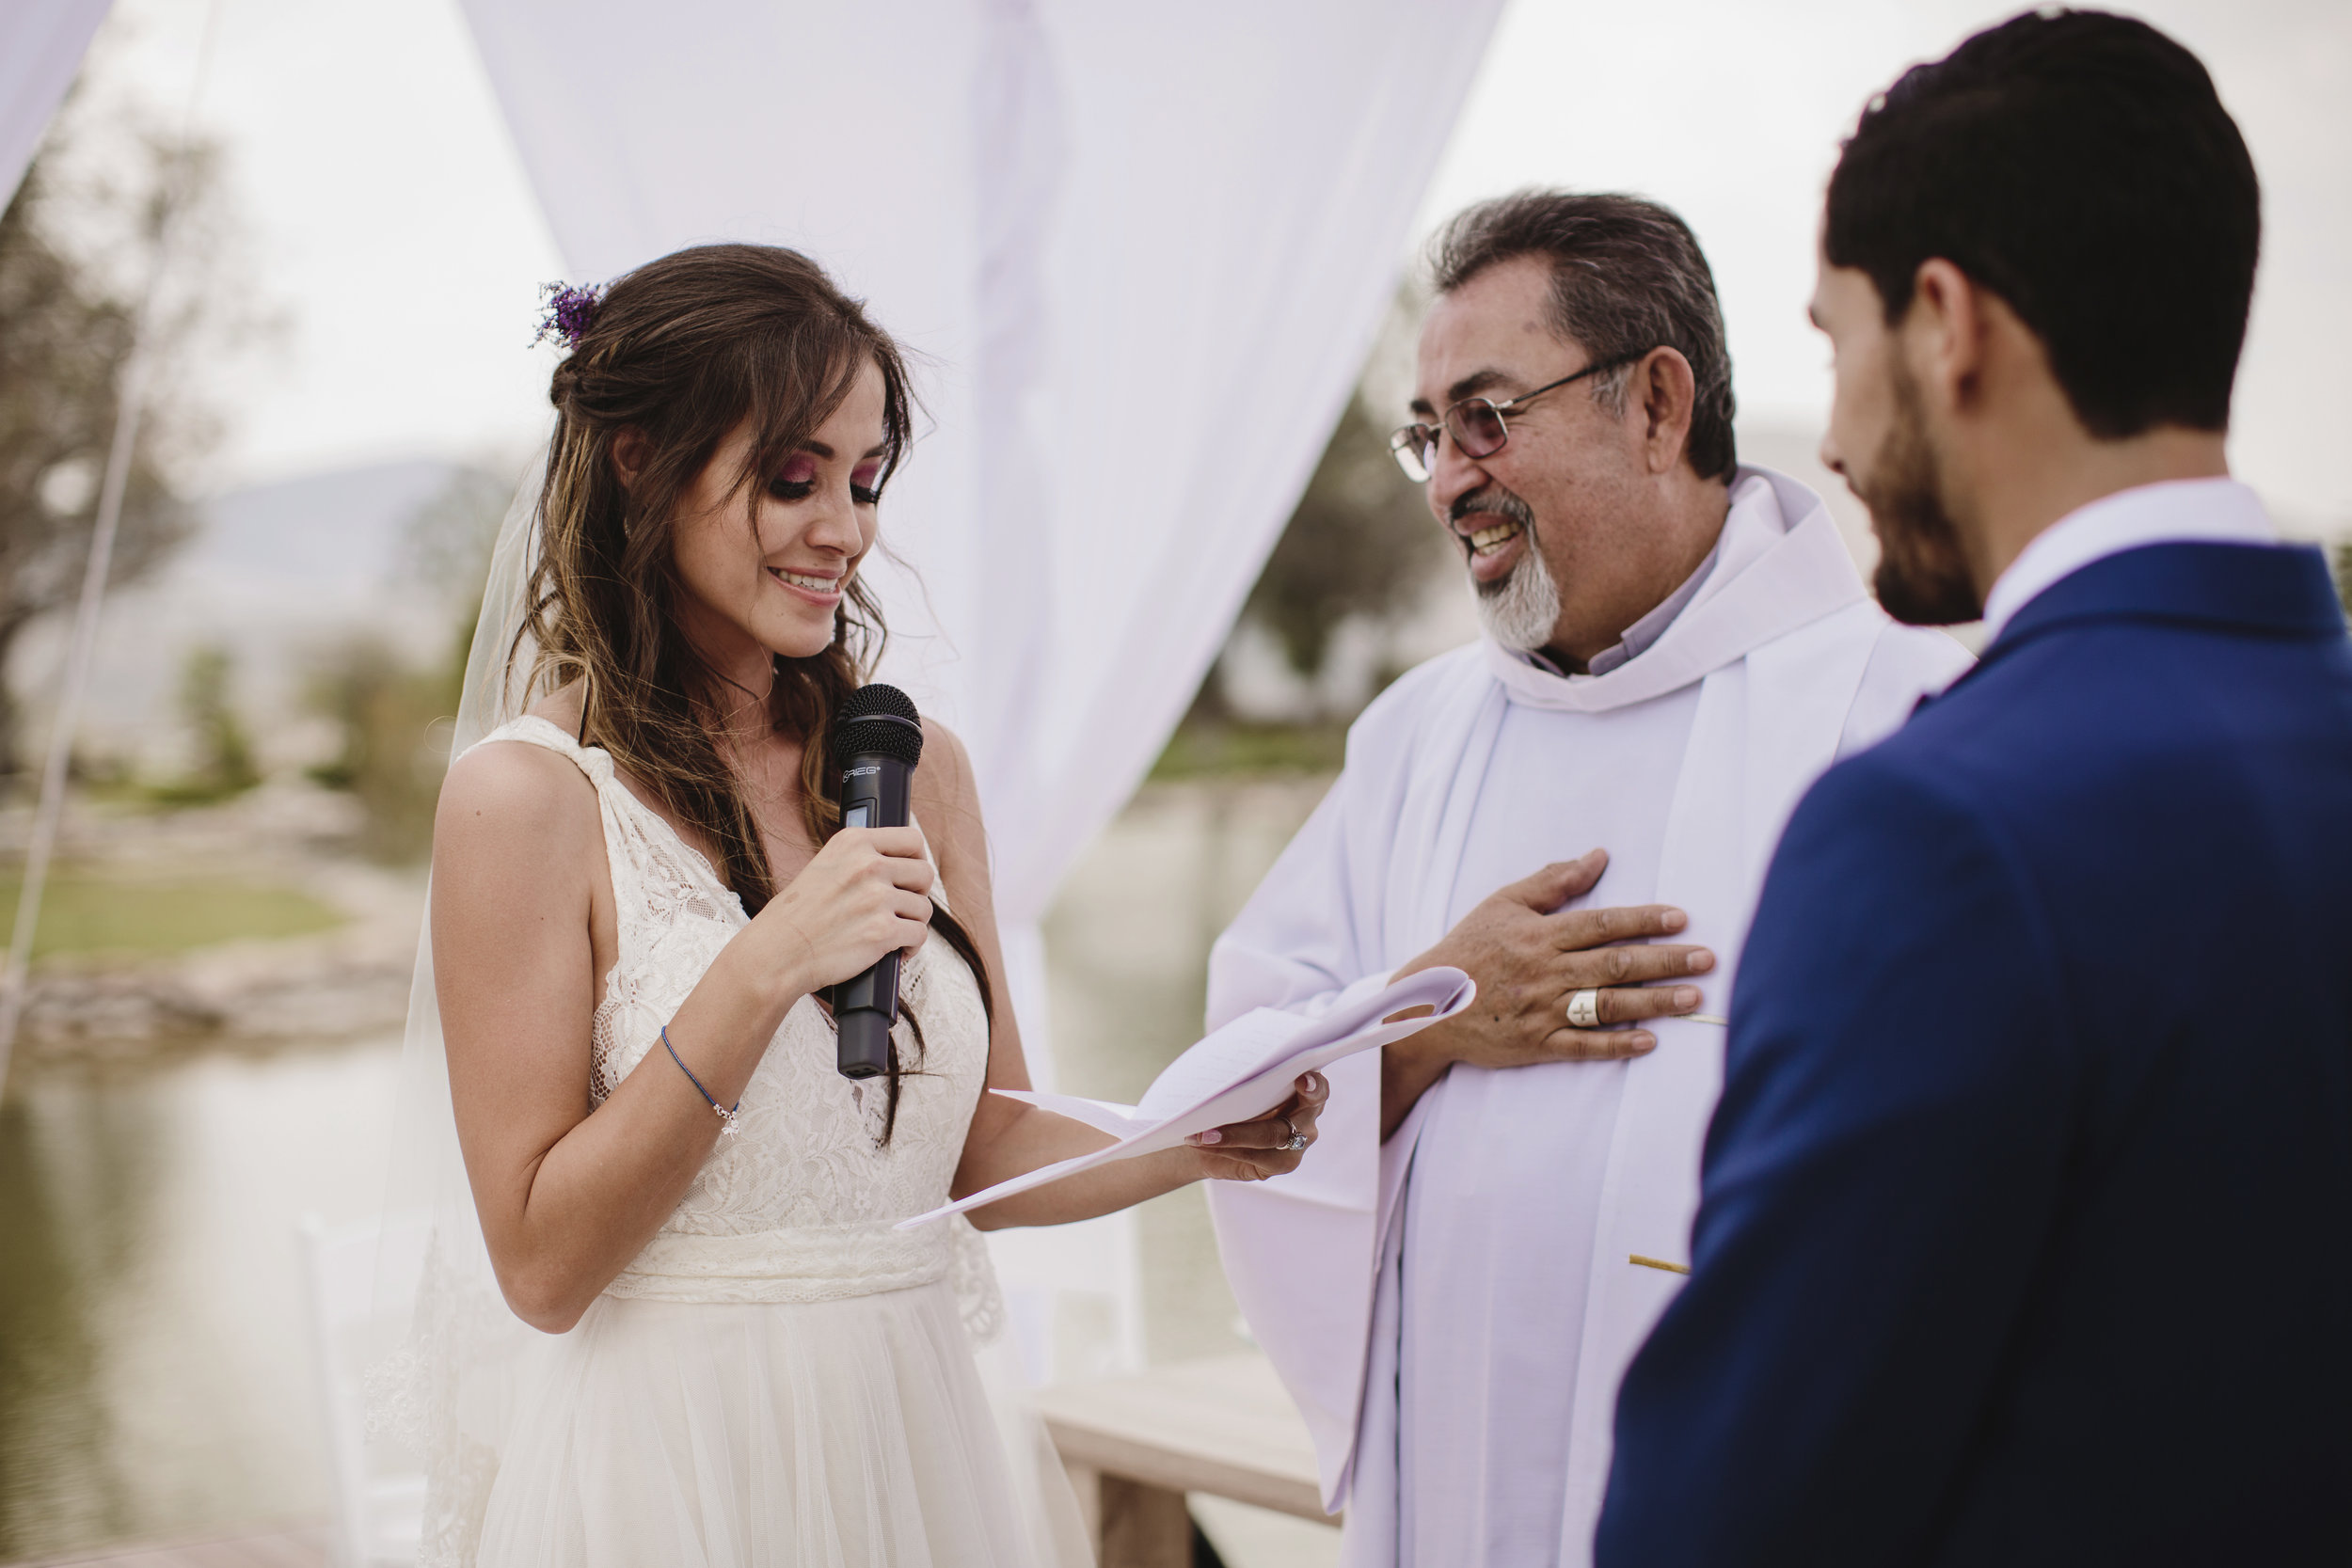 alfons_flores_destination_wedding_photography_mavi_david-1025.JPG